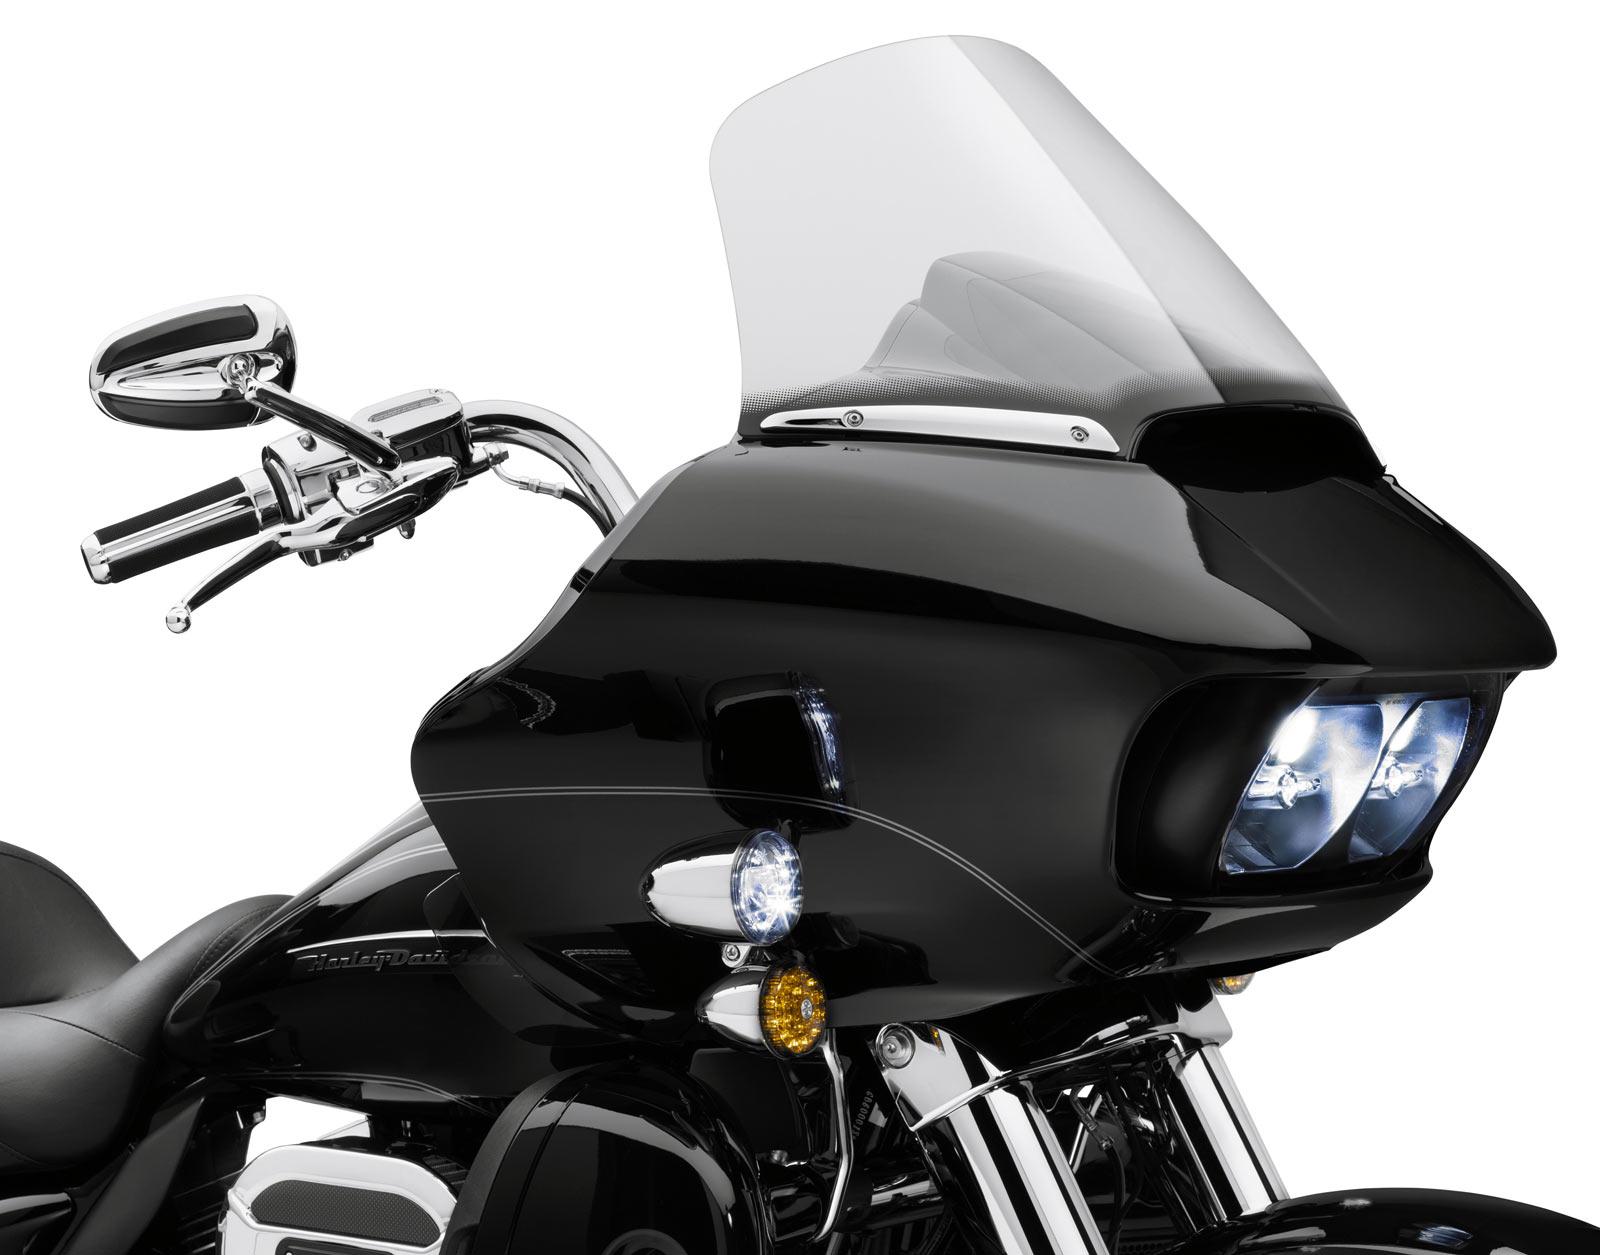 68000183 Montage-Kit für LED Nebelscheinwerfer chrom im Thunderbike Shop